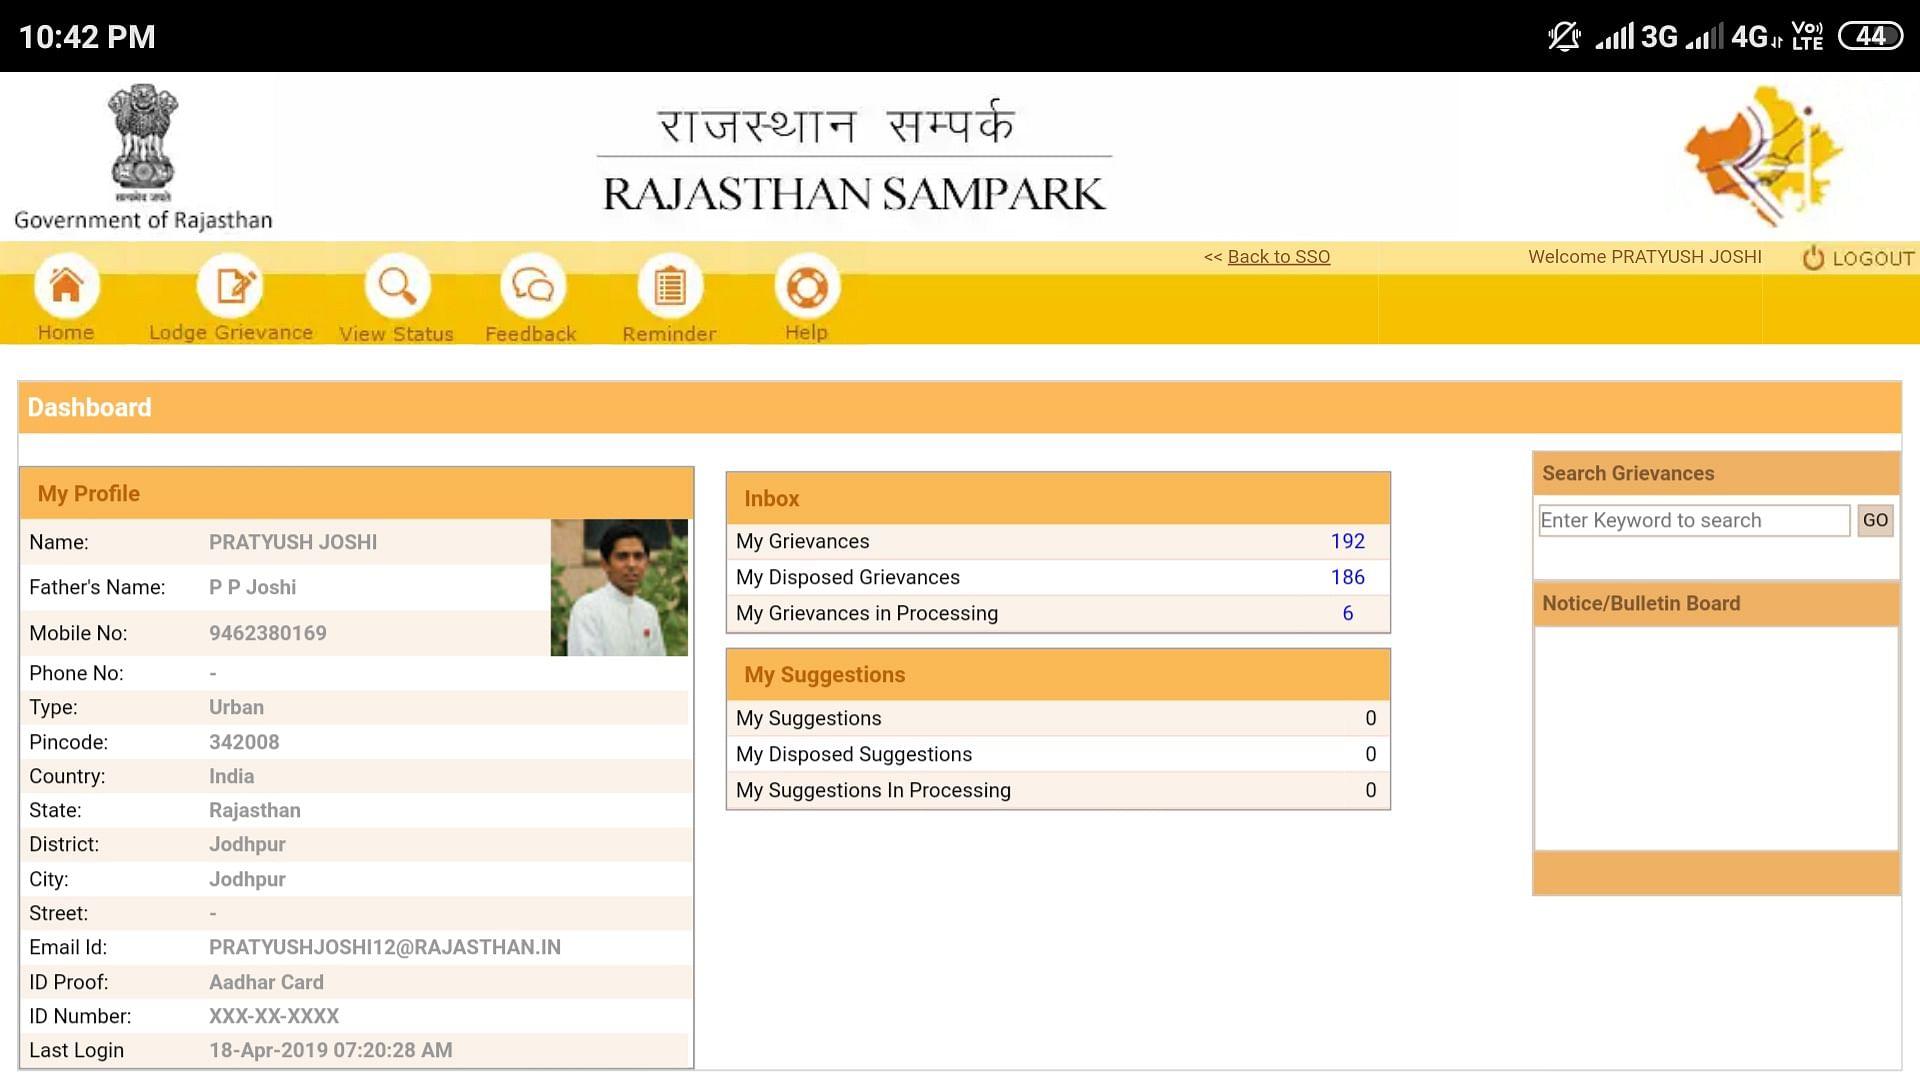 Screenshot of Pratyush's Rajasthan Sampark Account.